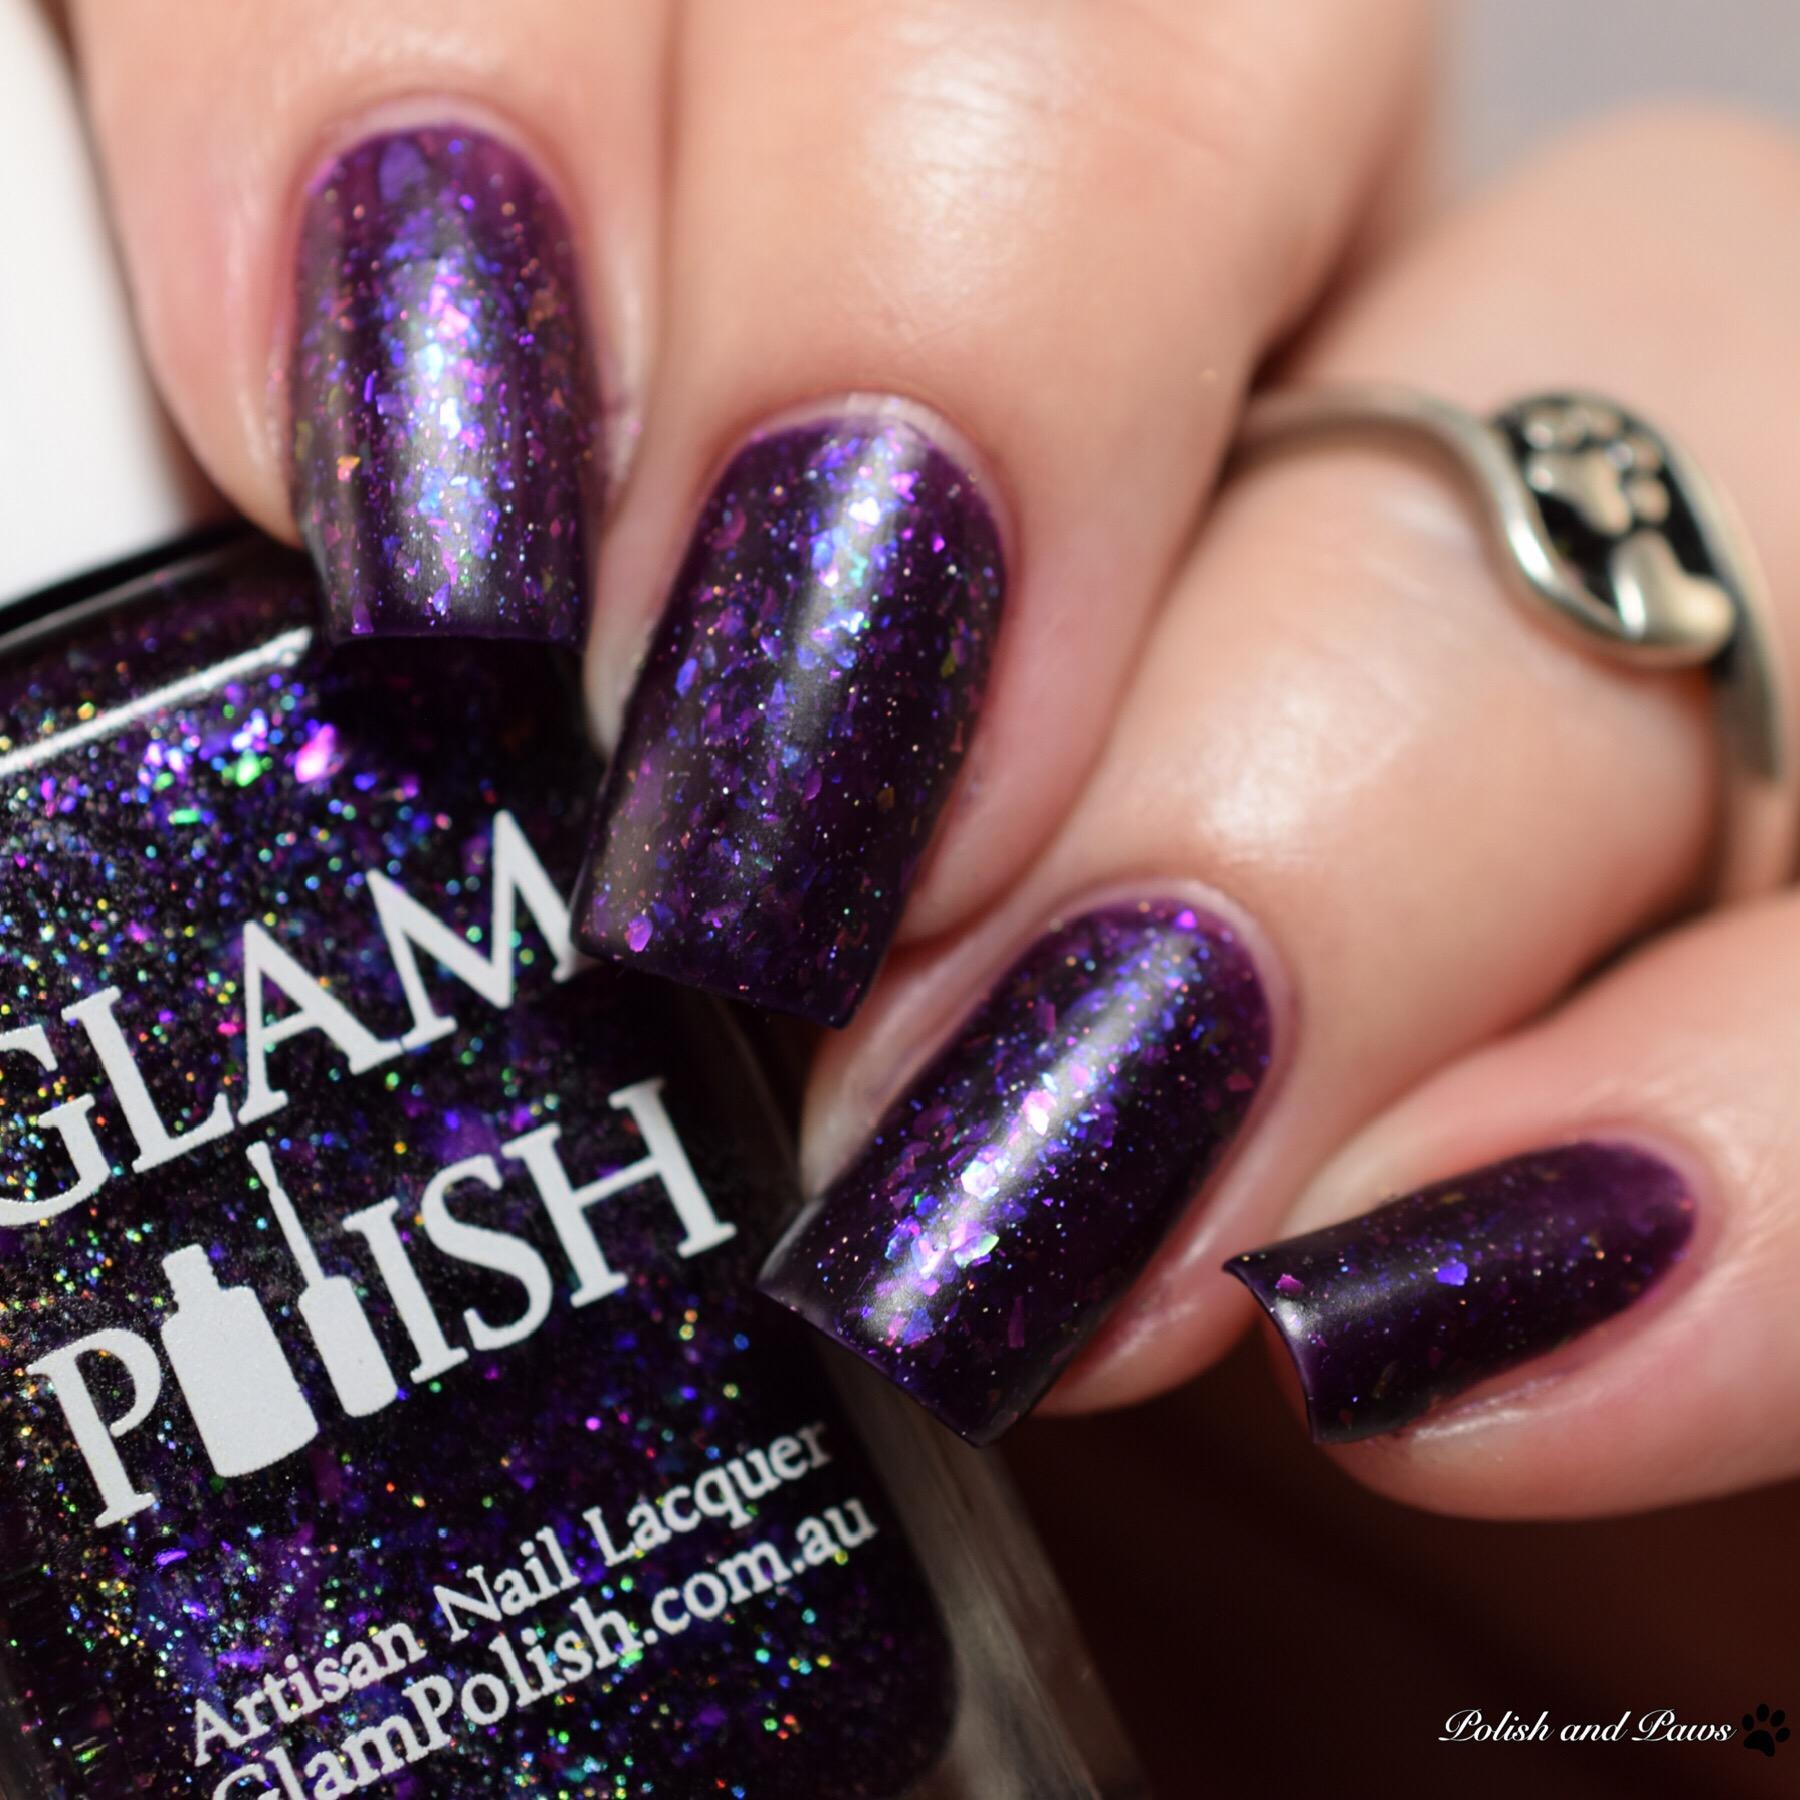 Glam Polish Dream Big Little Mermaid